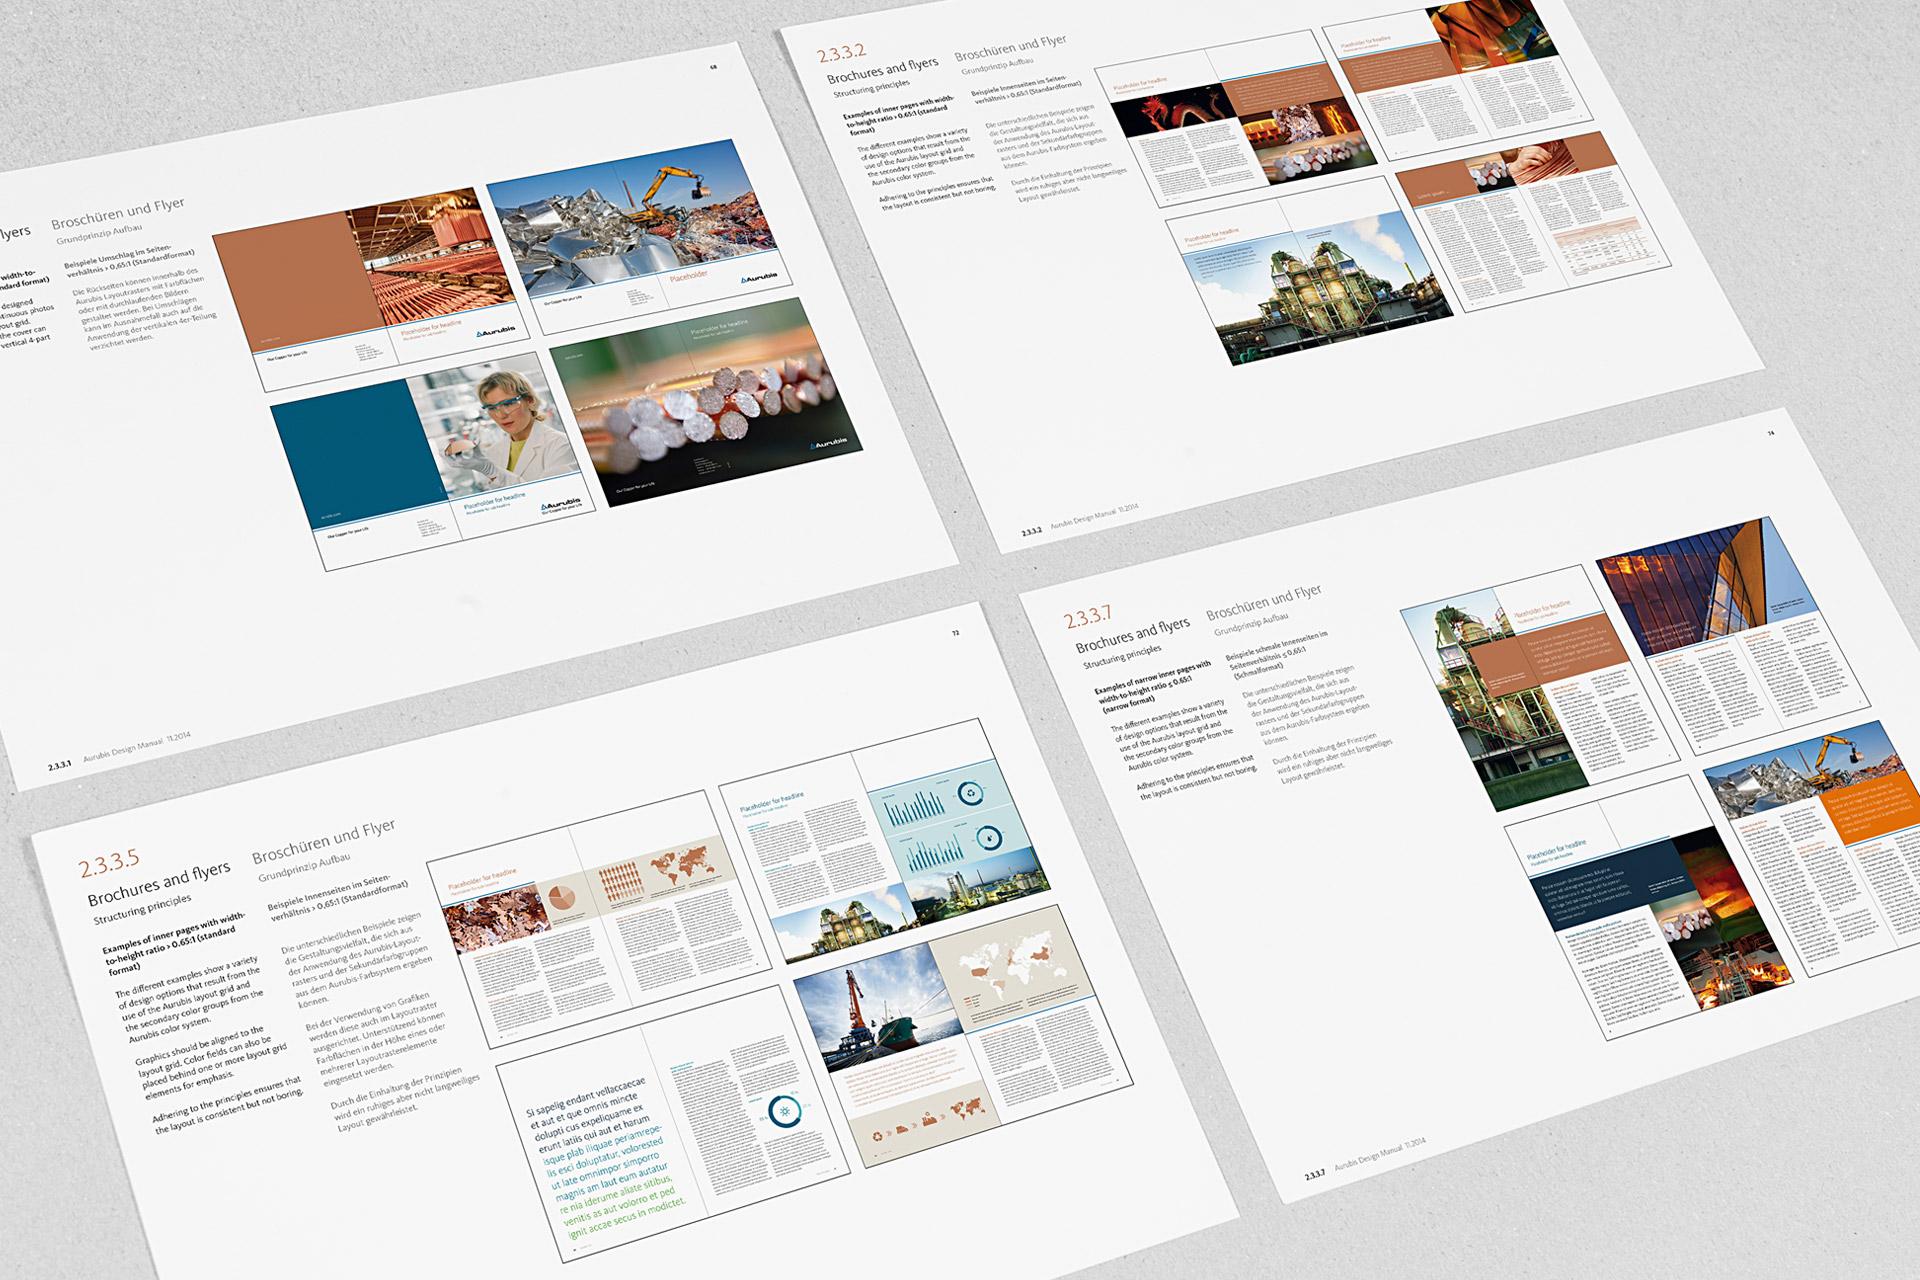 aurubis-corporate-design manualseiten